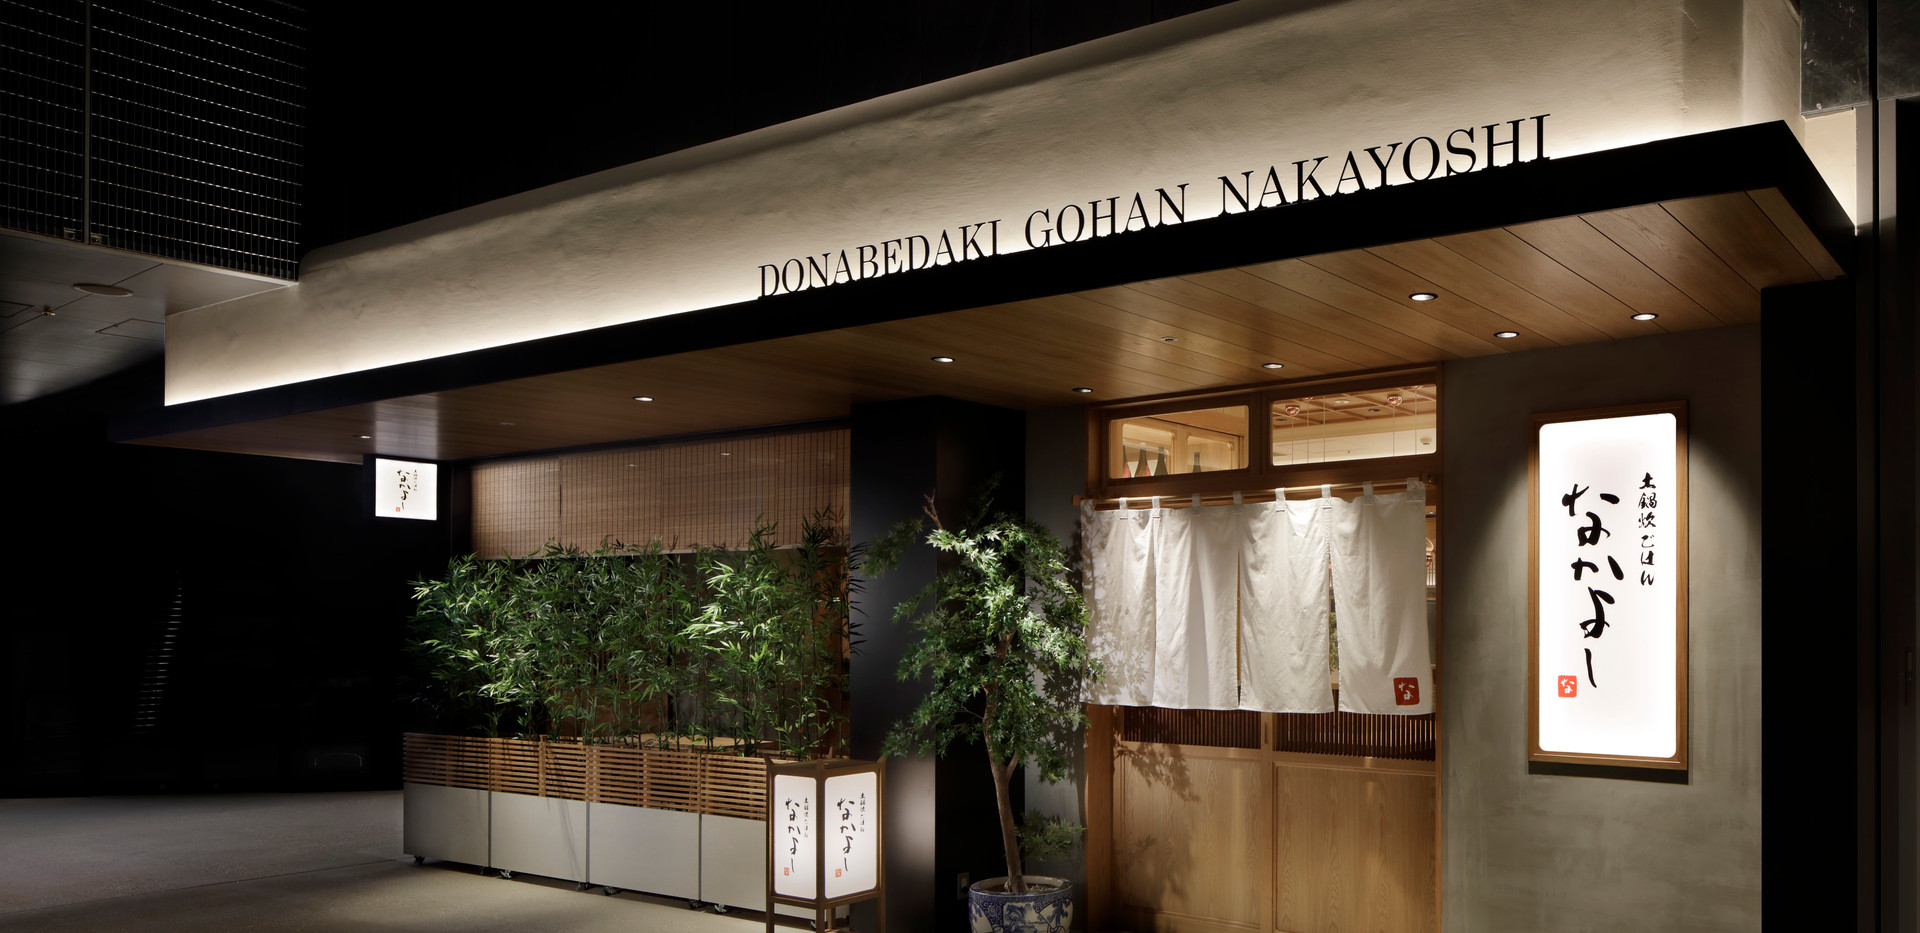 nakayoshi_shibuyastream_004.jpg